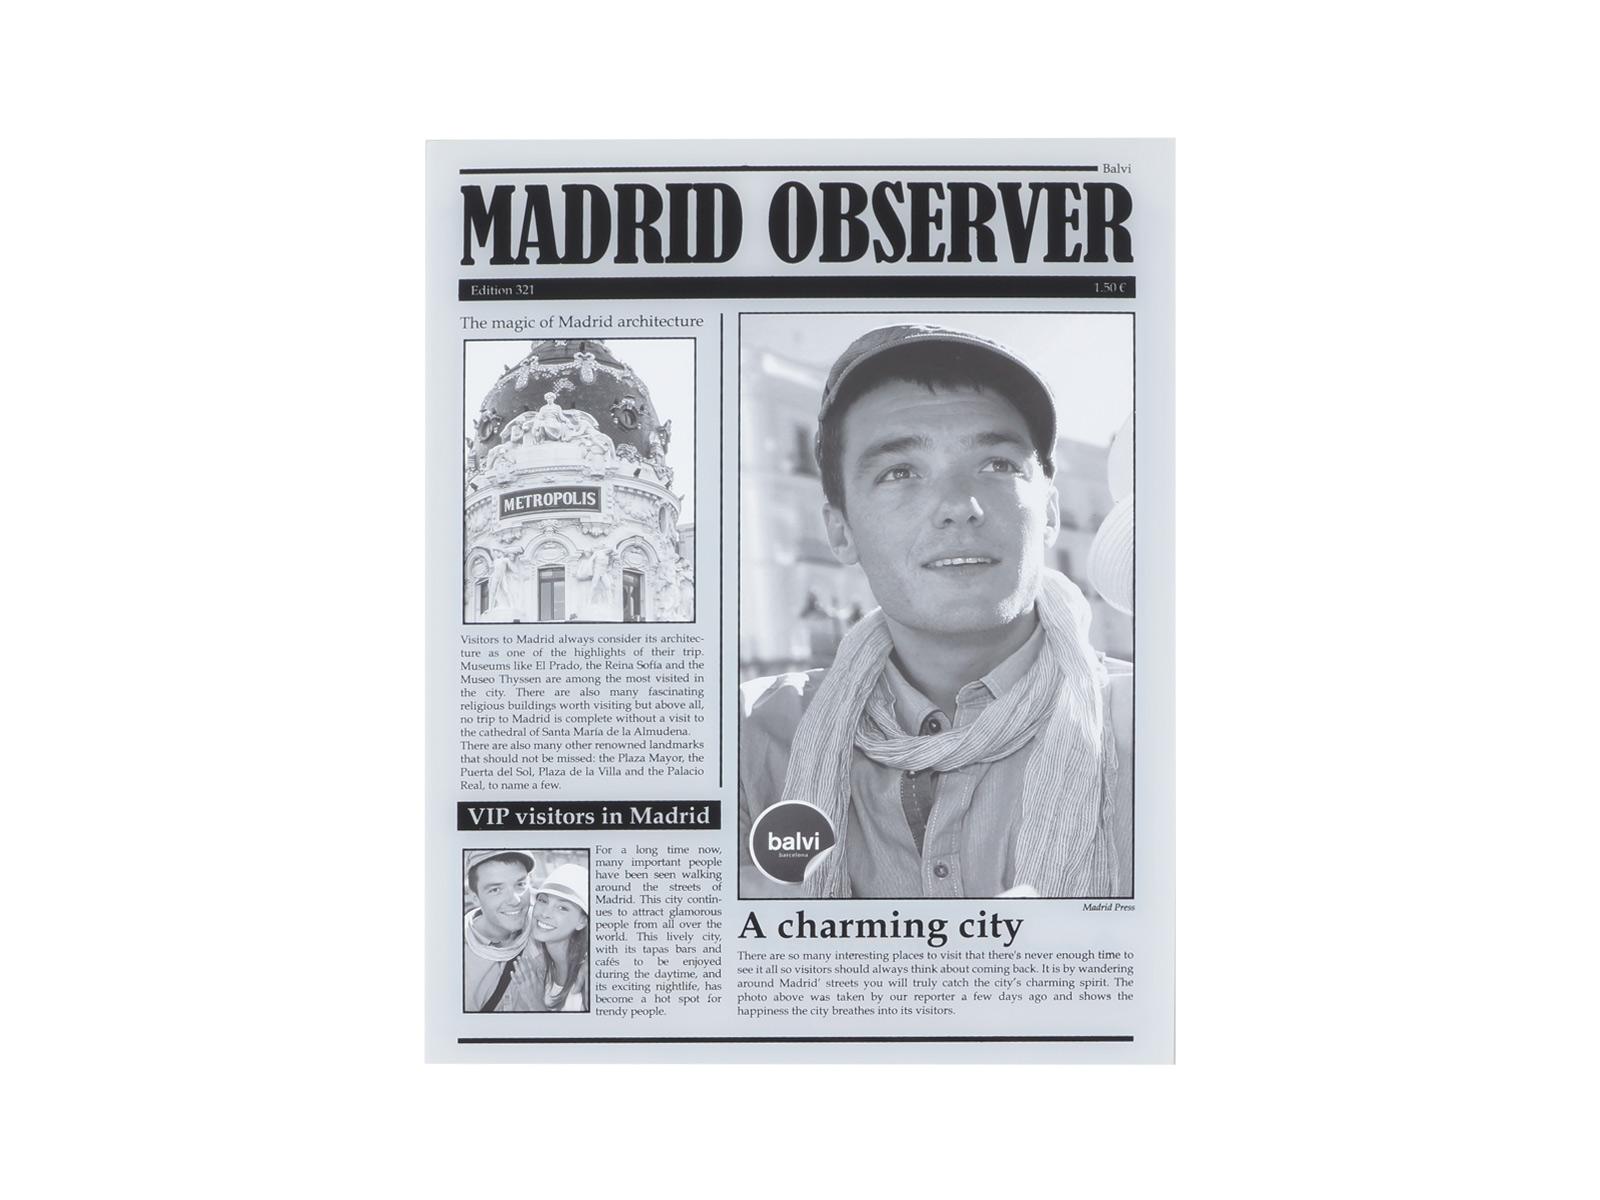 Фоторамка Madrid ObserverФоторамки<br>Фоторамка настольная, 15x20 см<br>